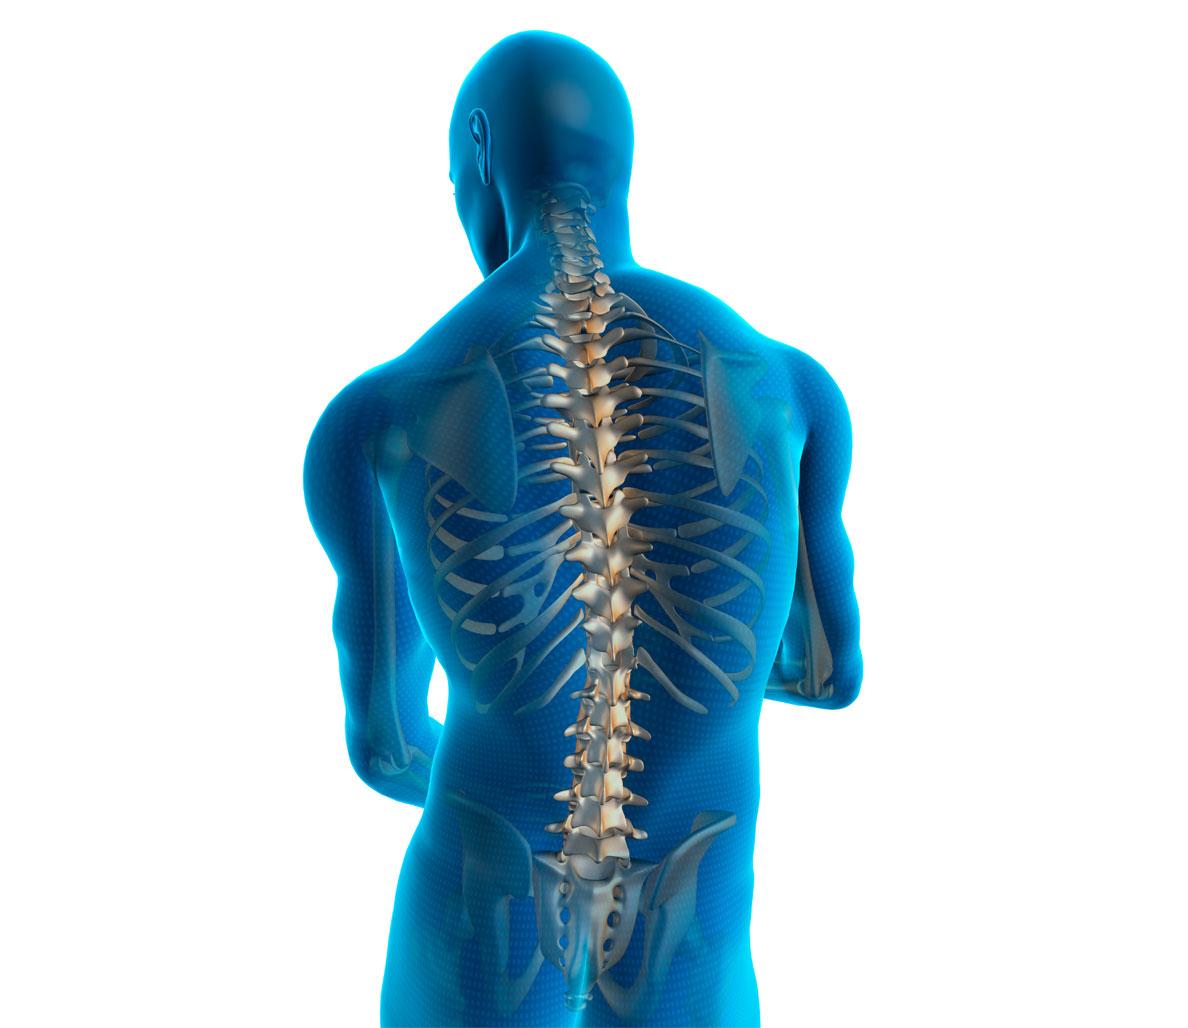 Shoulder clipart human back Injury Prevention Ways Pain Back